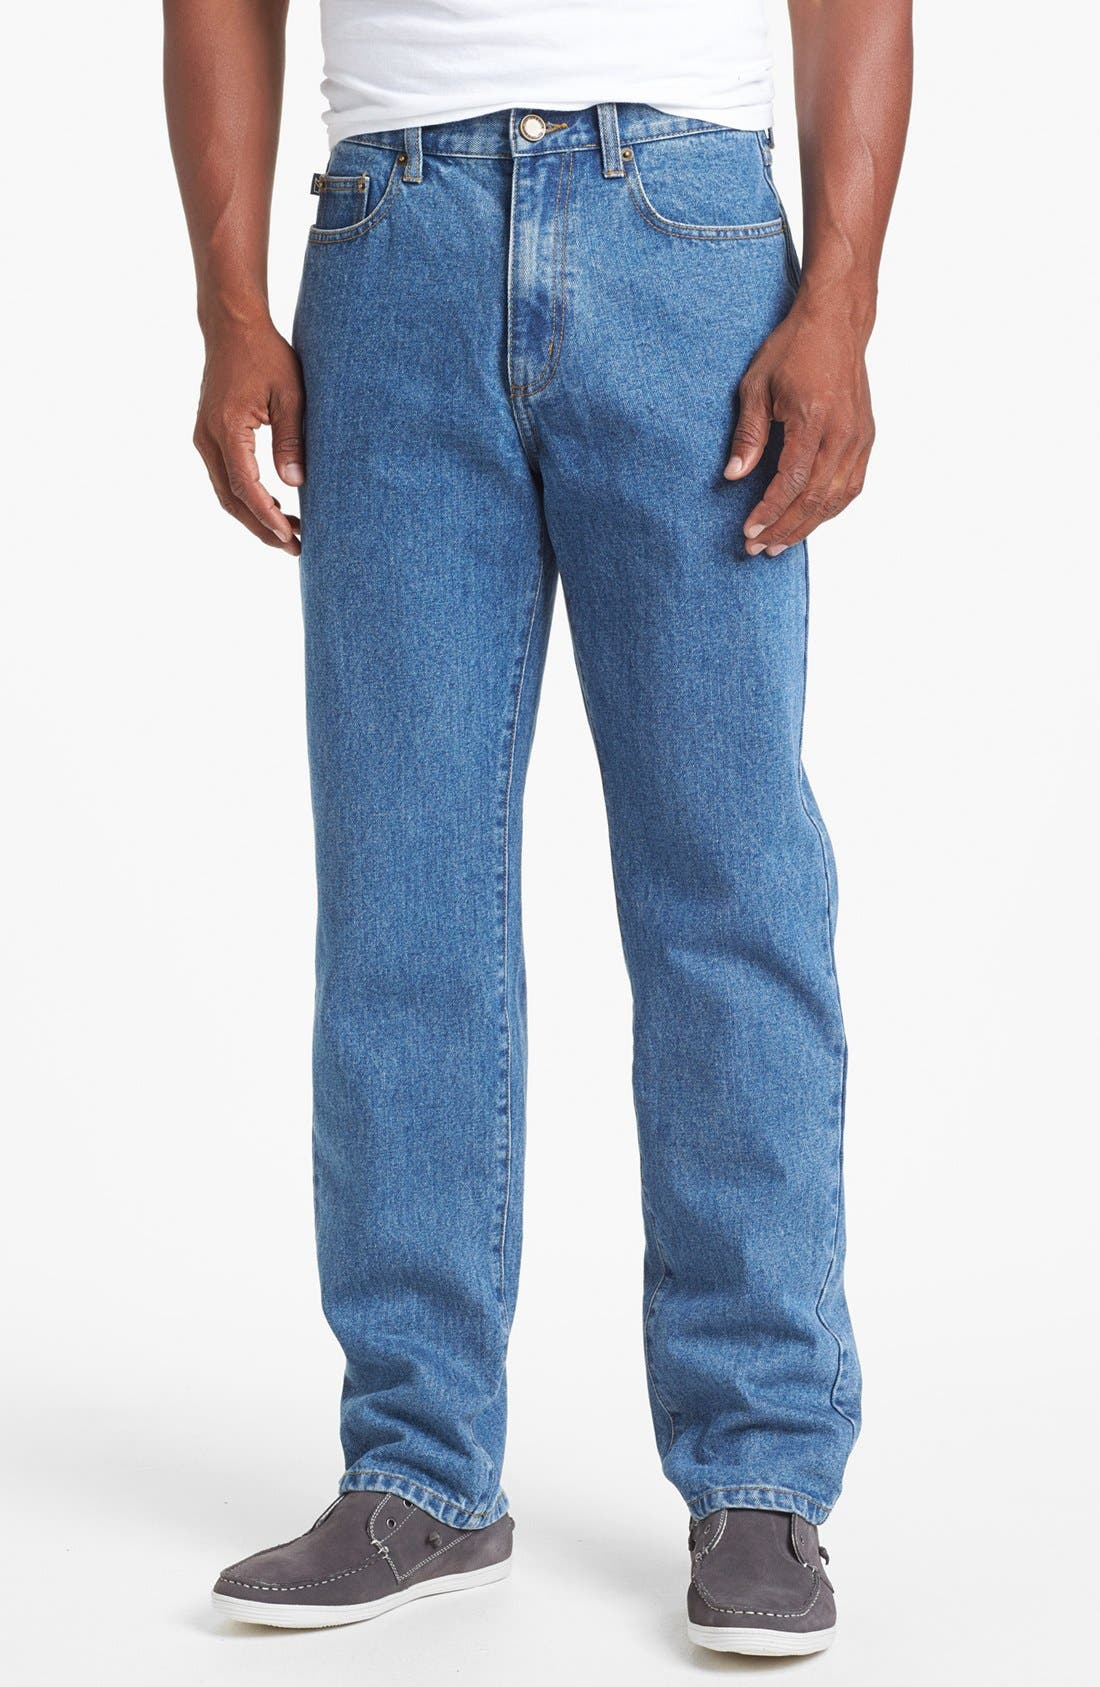 Cutter & Buck Classic Five Pocket Straight Leg Jeans (Denim Wash)